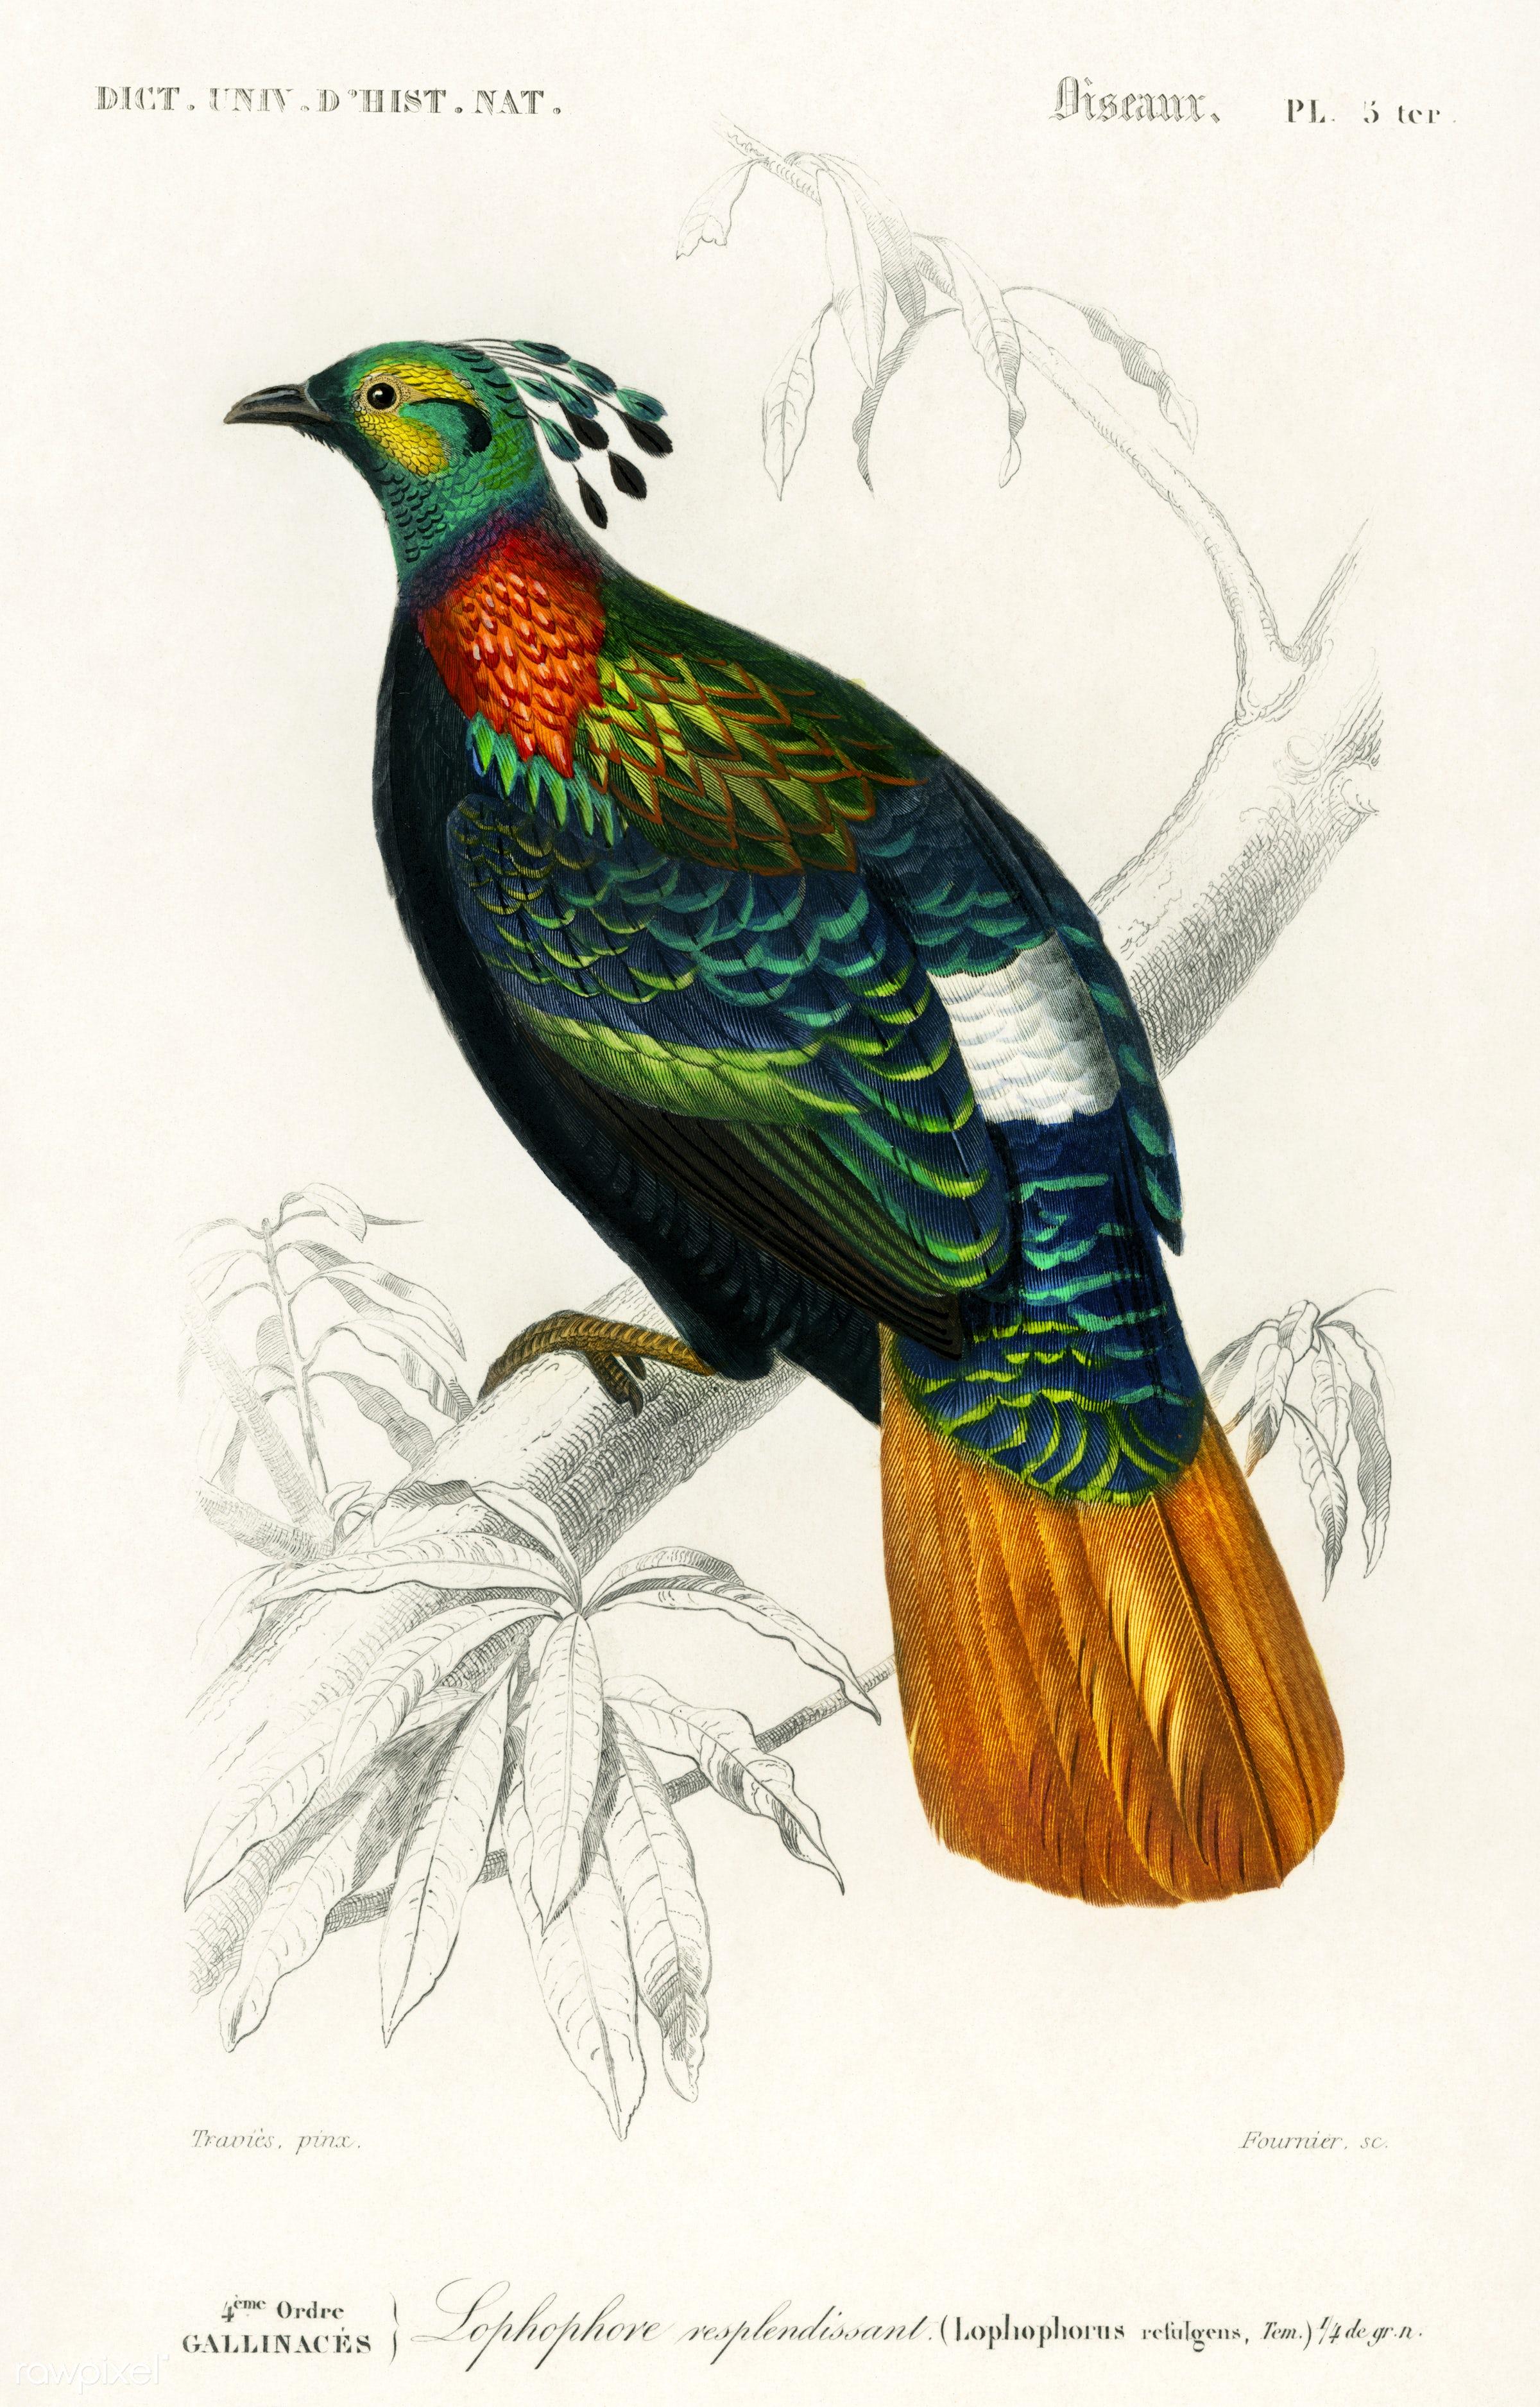 Himalayan monal (Lophophorus refulgens) illustrated by Charles Dessalines D' Orbigny (1806-1876). Digitally enhanced...